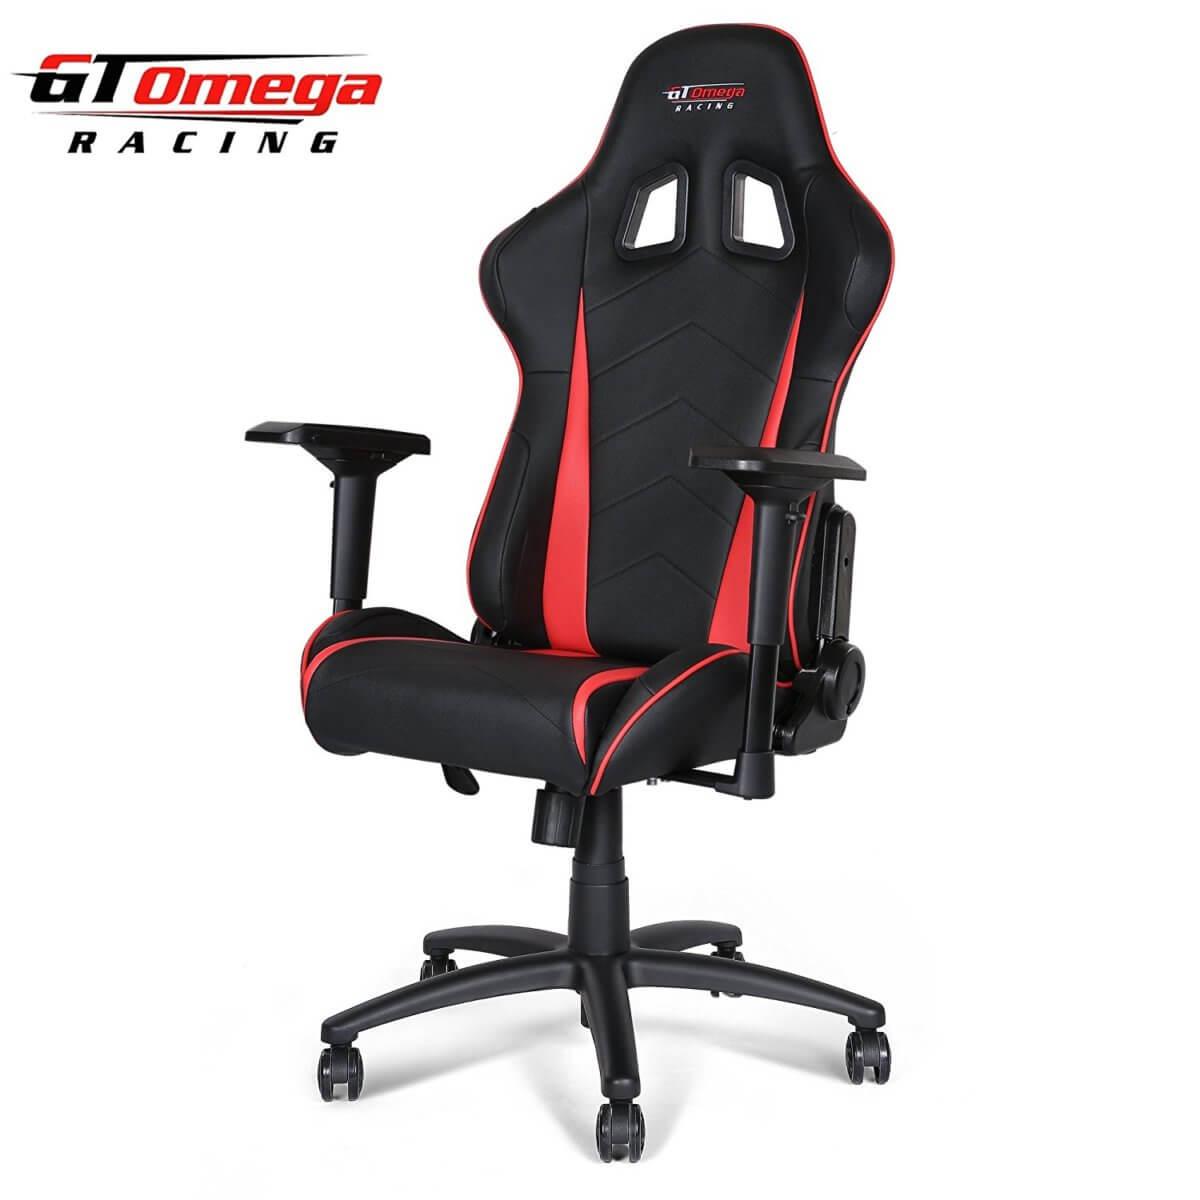 Gt-omega-racing